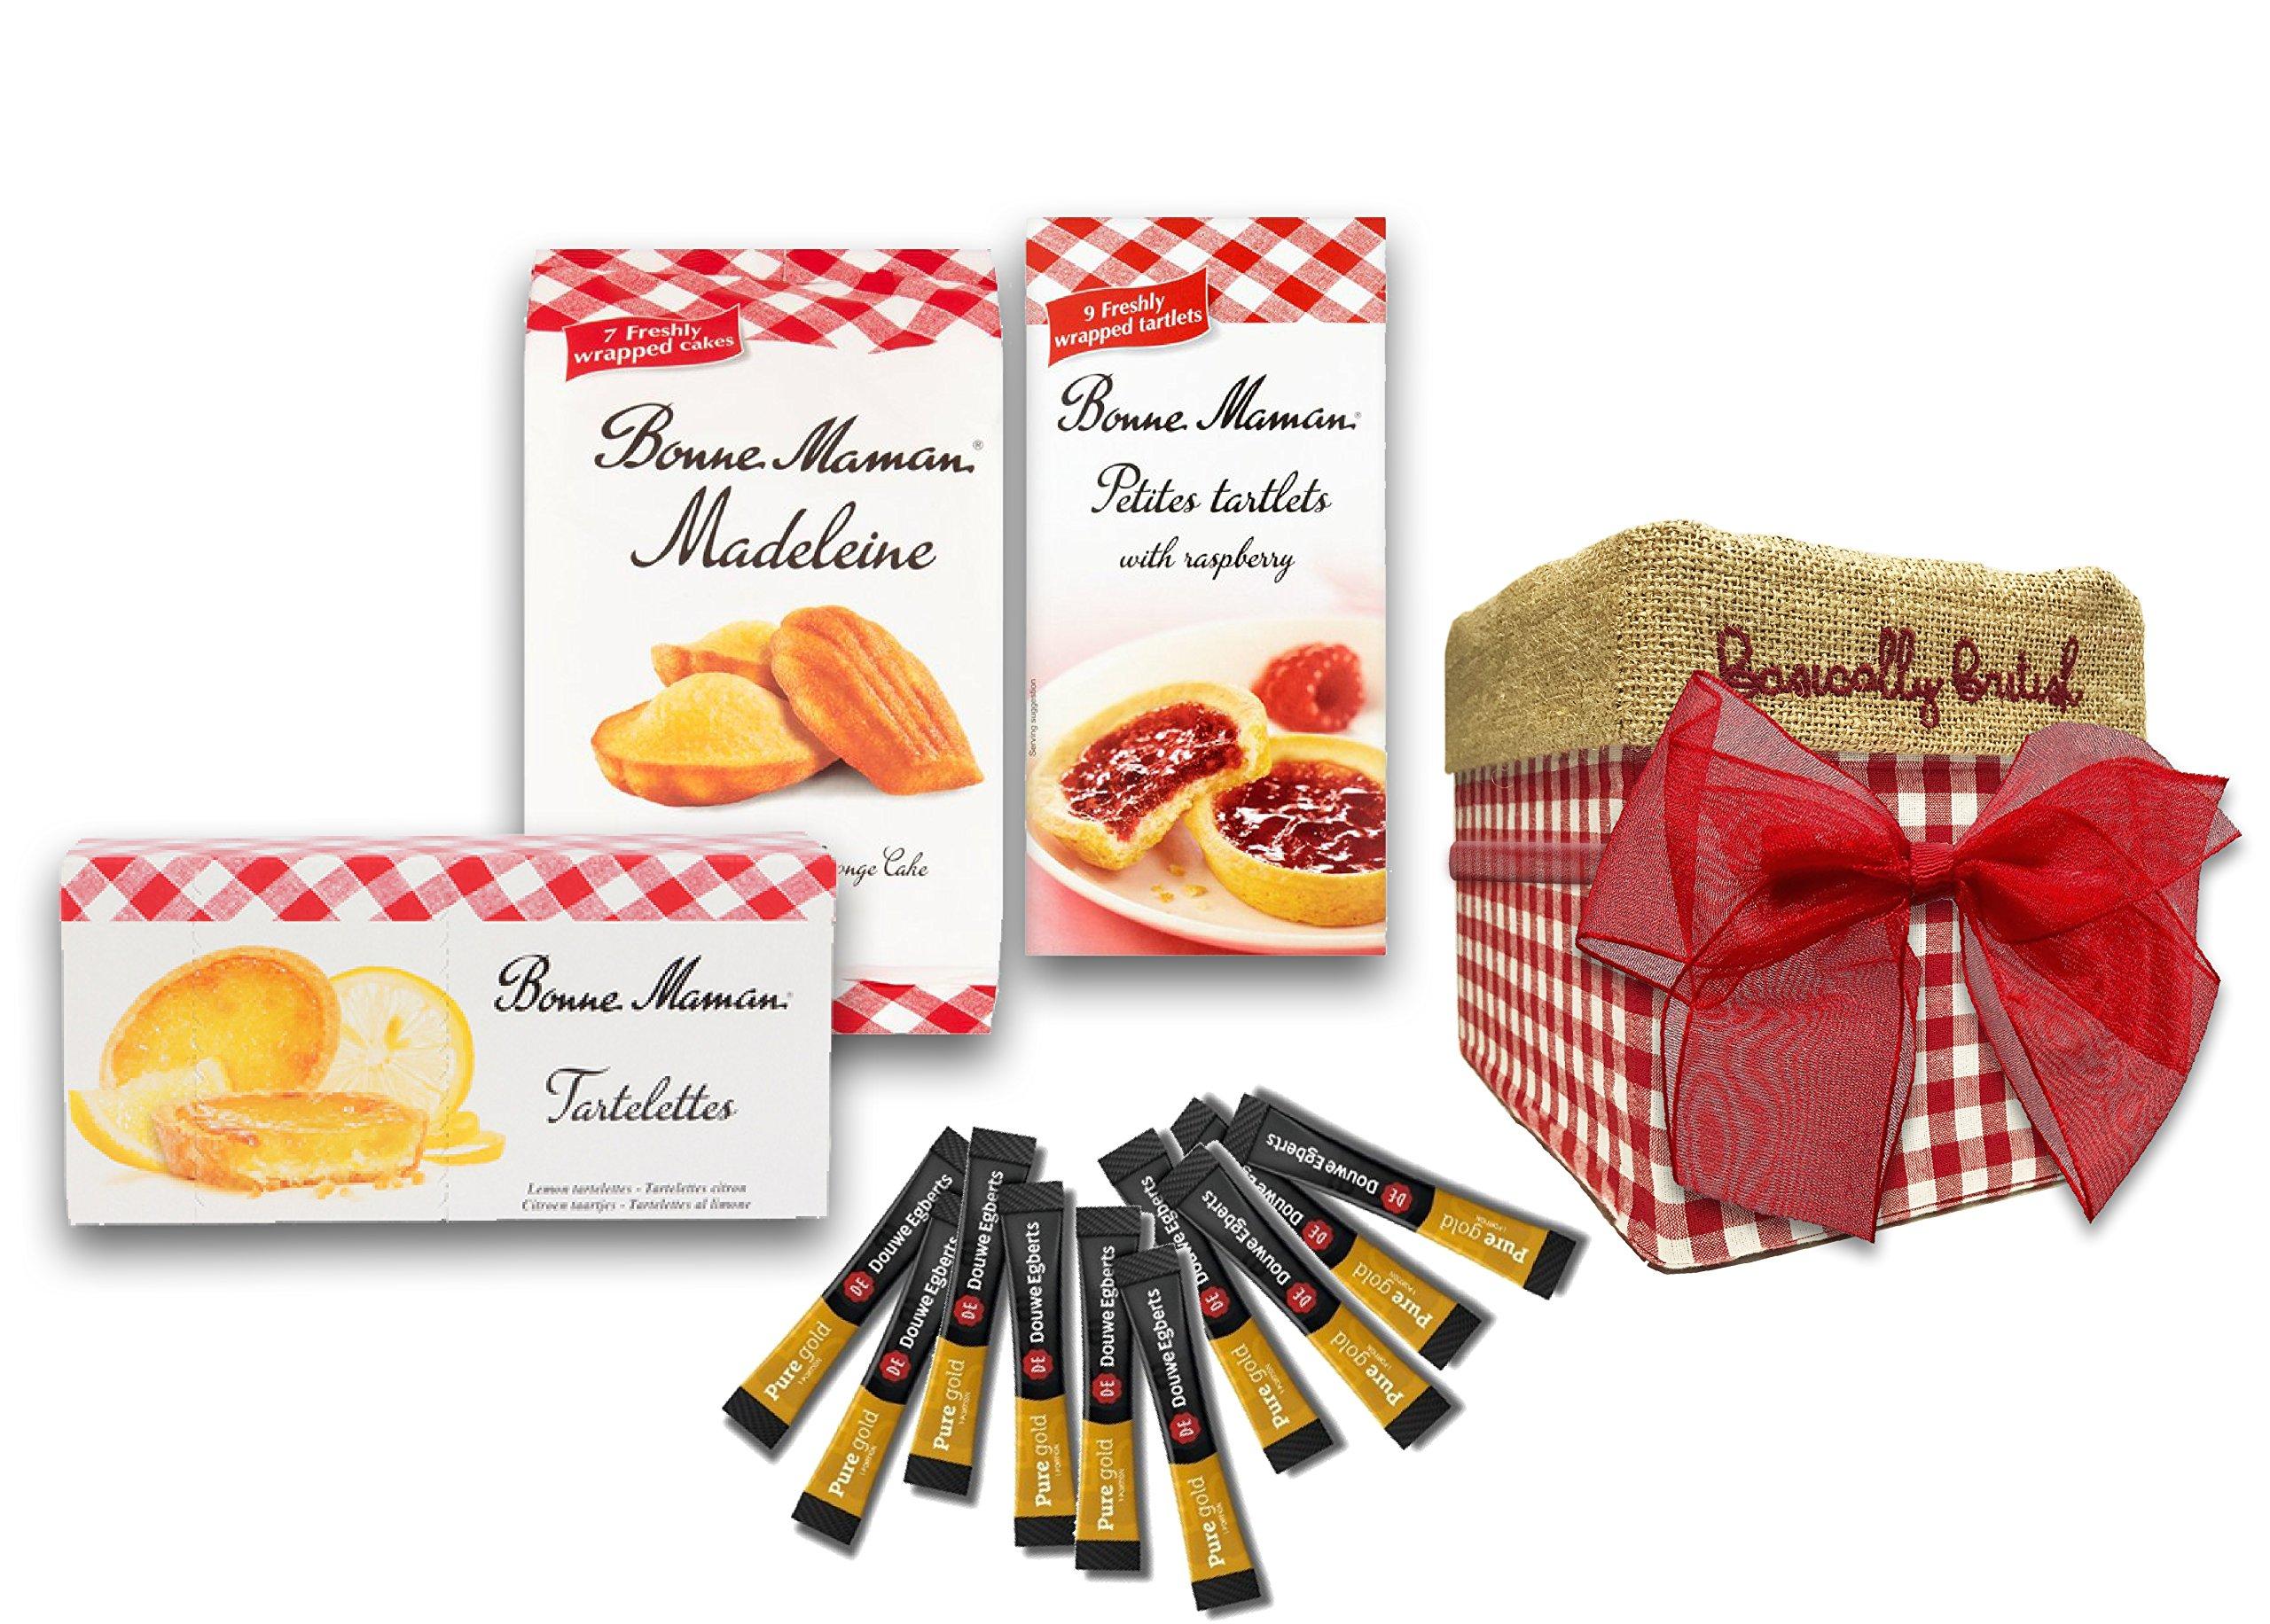 Bonne Maman Madeleins, Bonne Maman Lemon Tartlets & Bonne Maman Raspberry Tartlets in Basically British Jute Storage Box